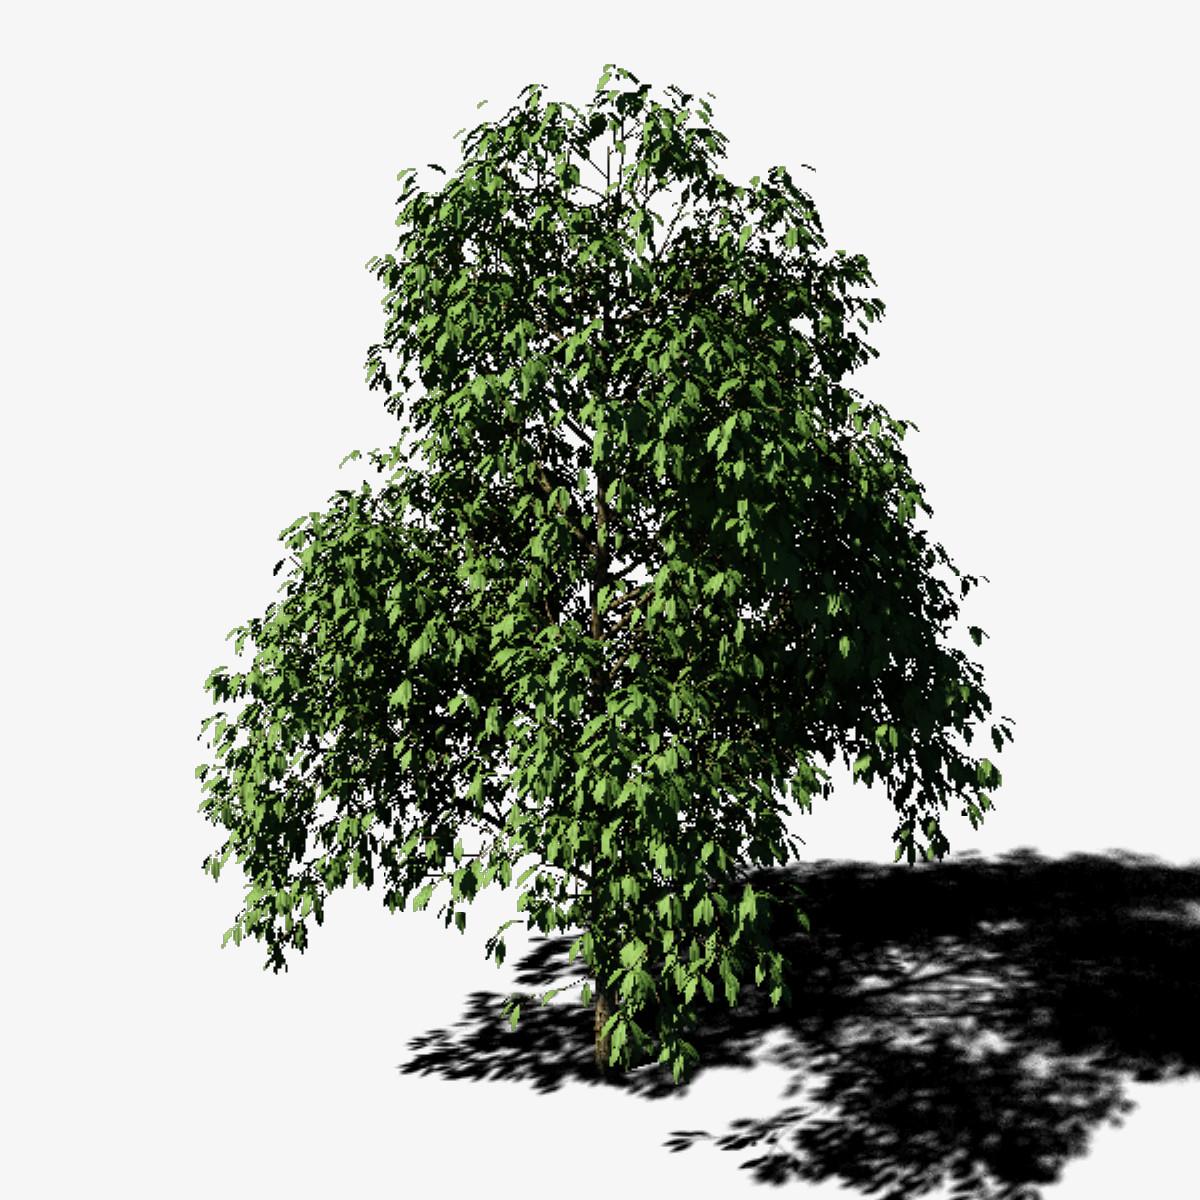 Tree_0001.jpg